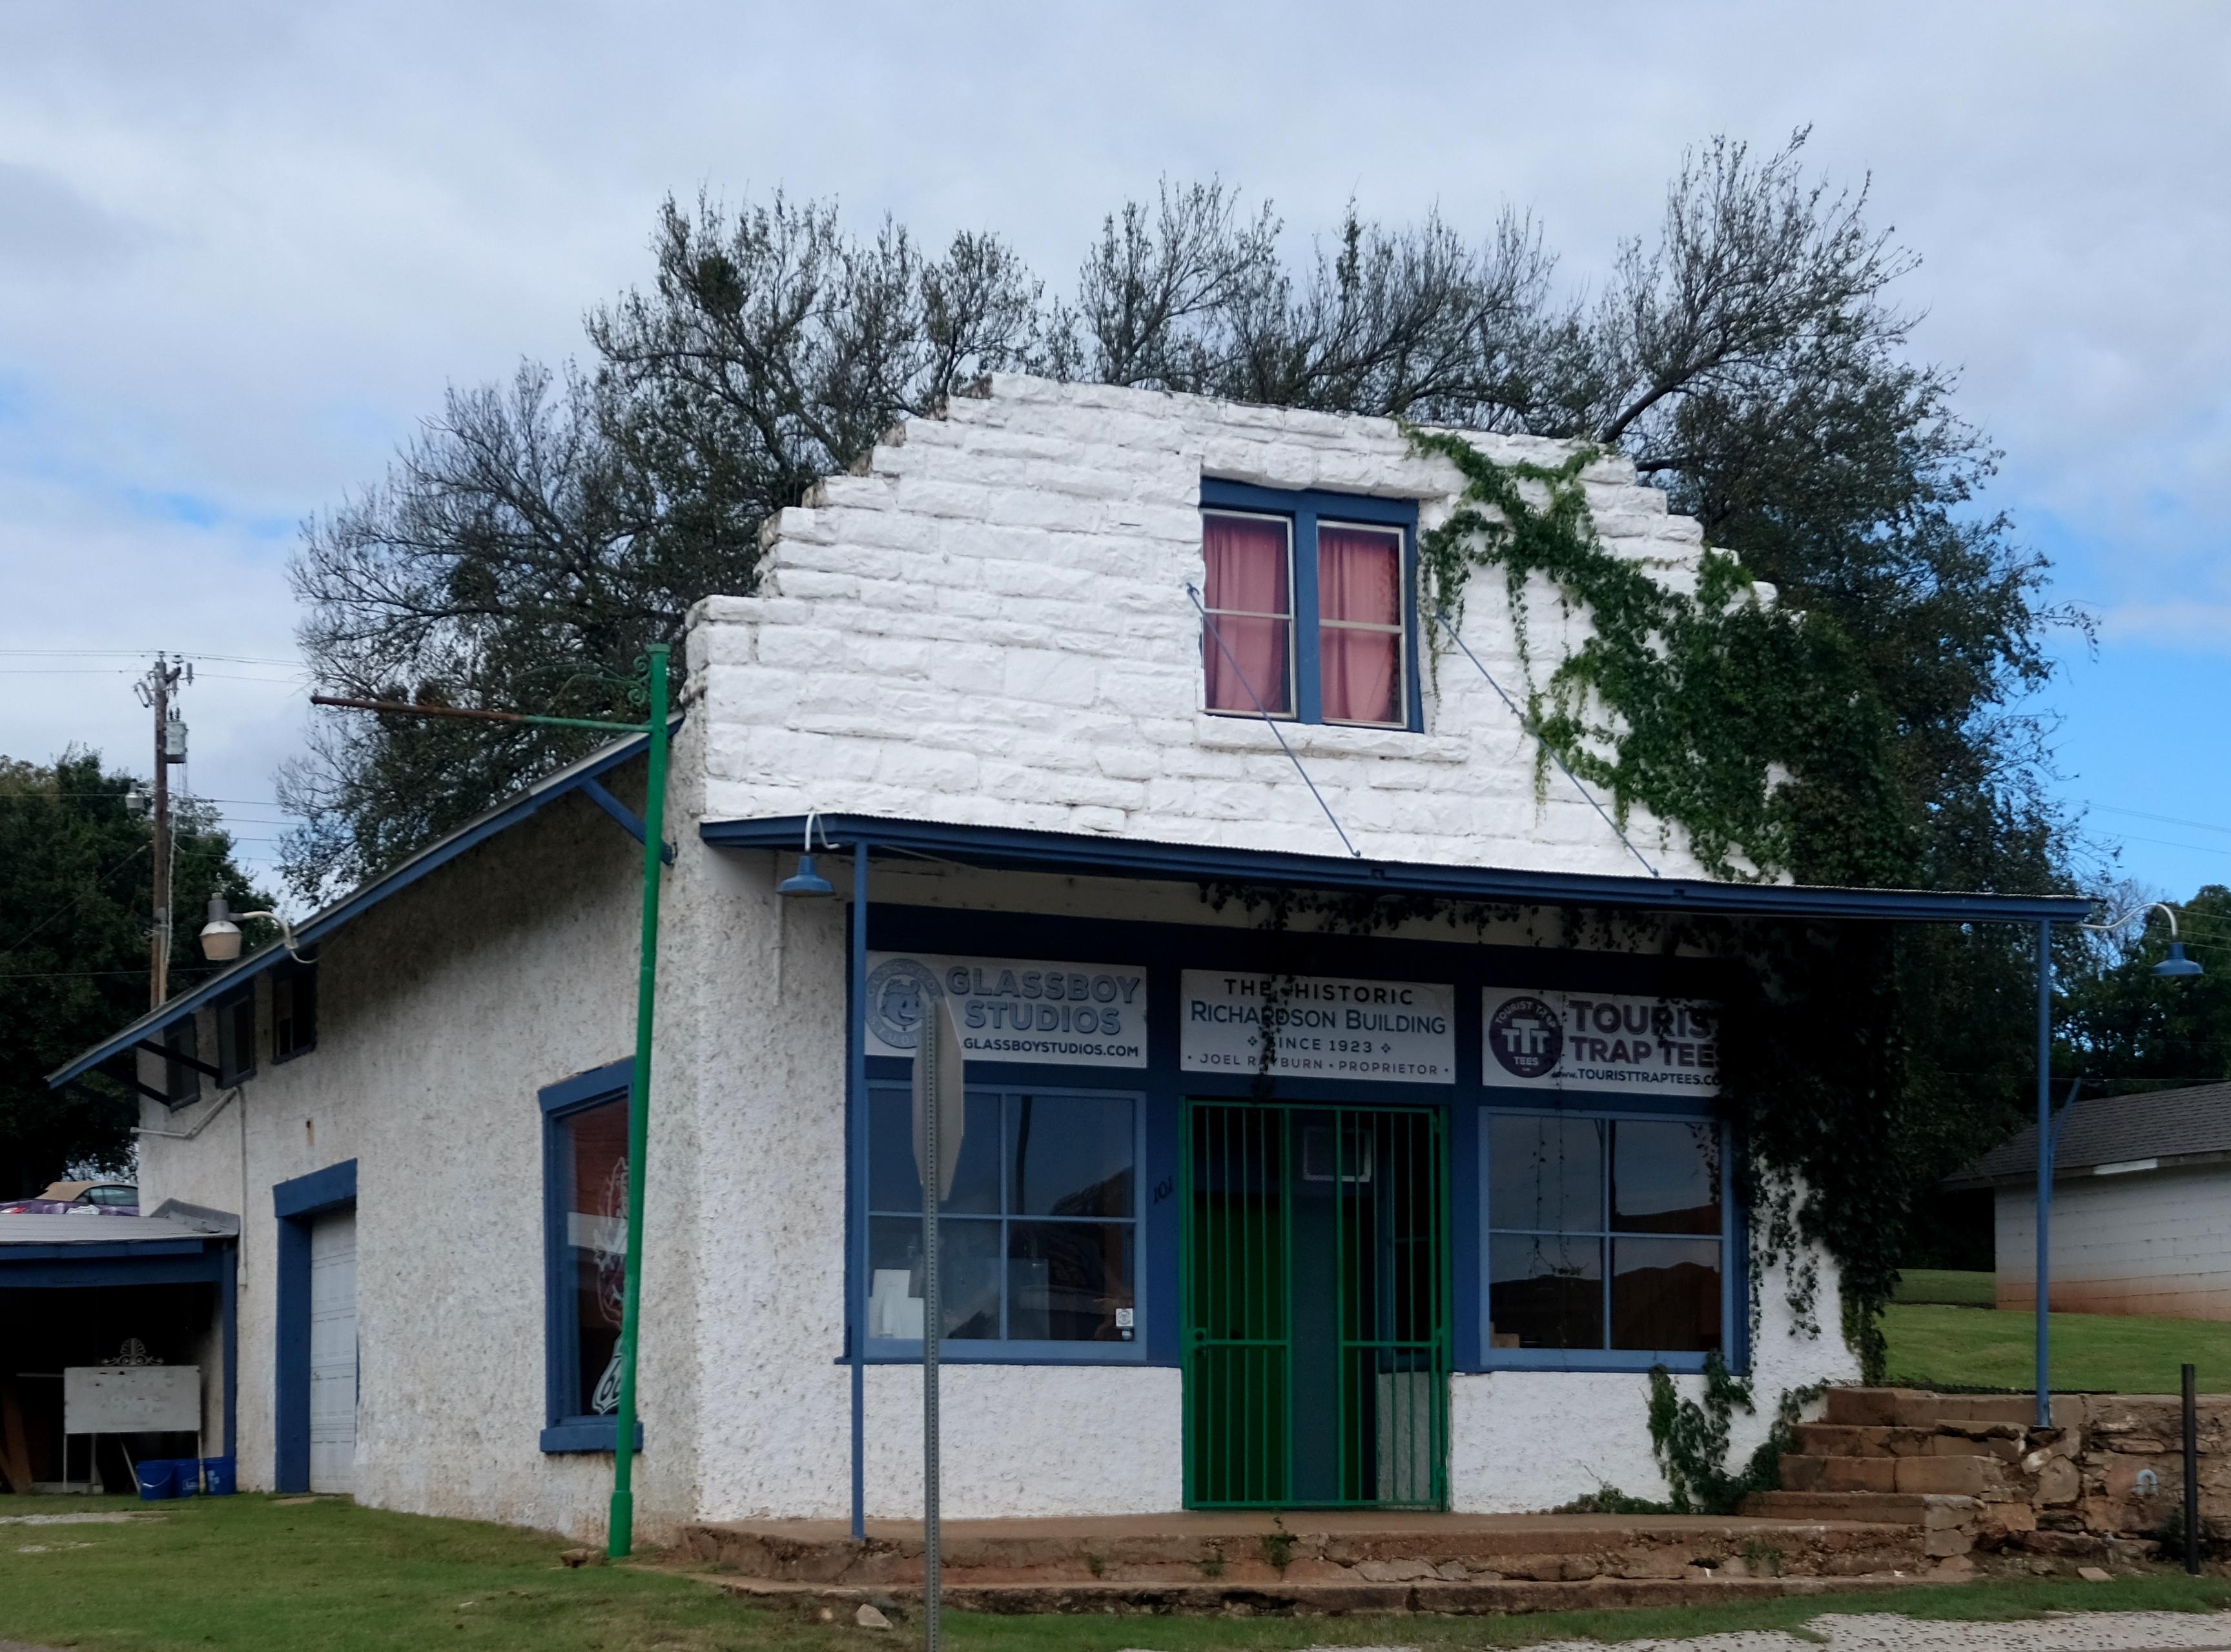 File:Edward Richardson Building jpg - Wikimedia Commons